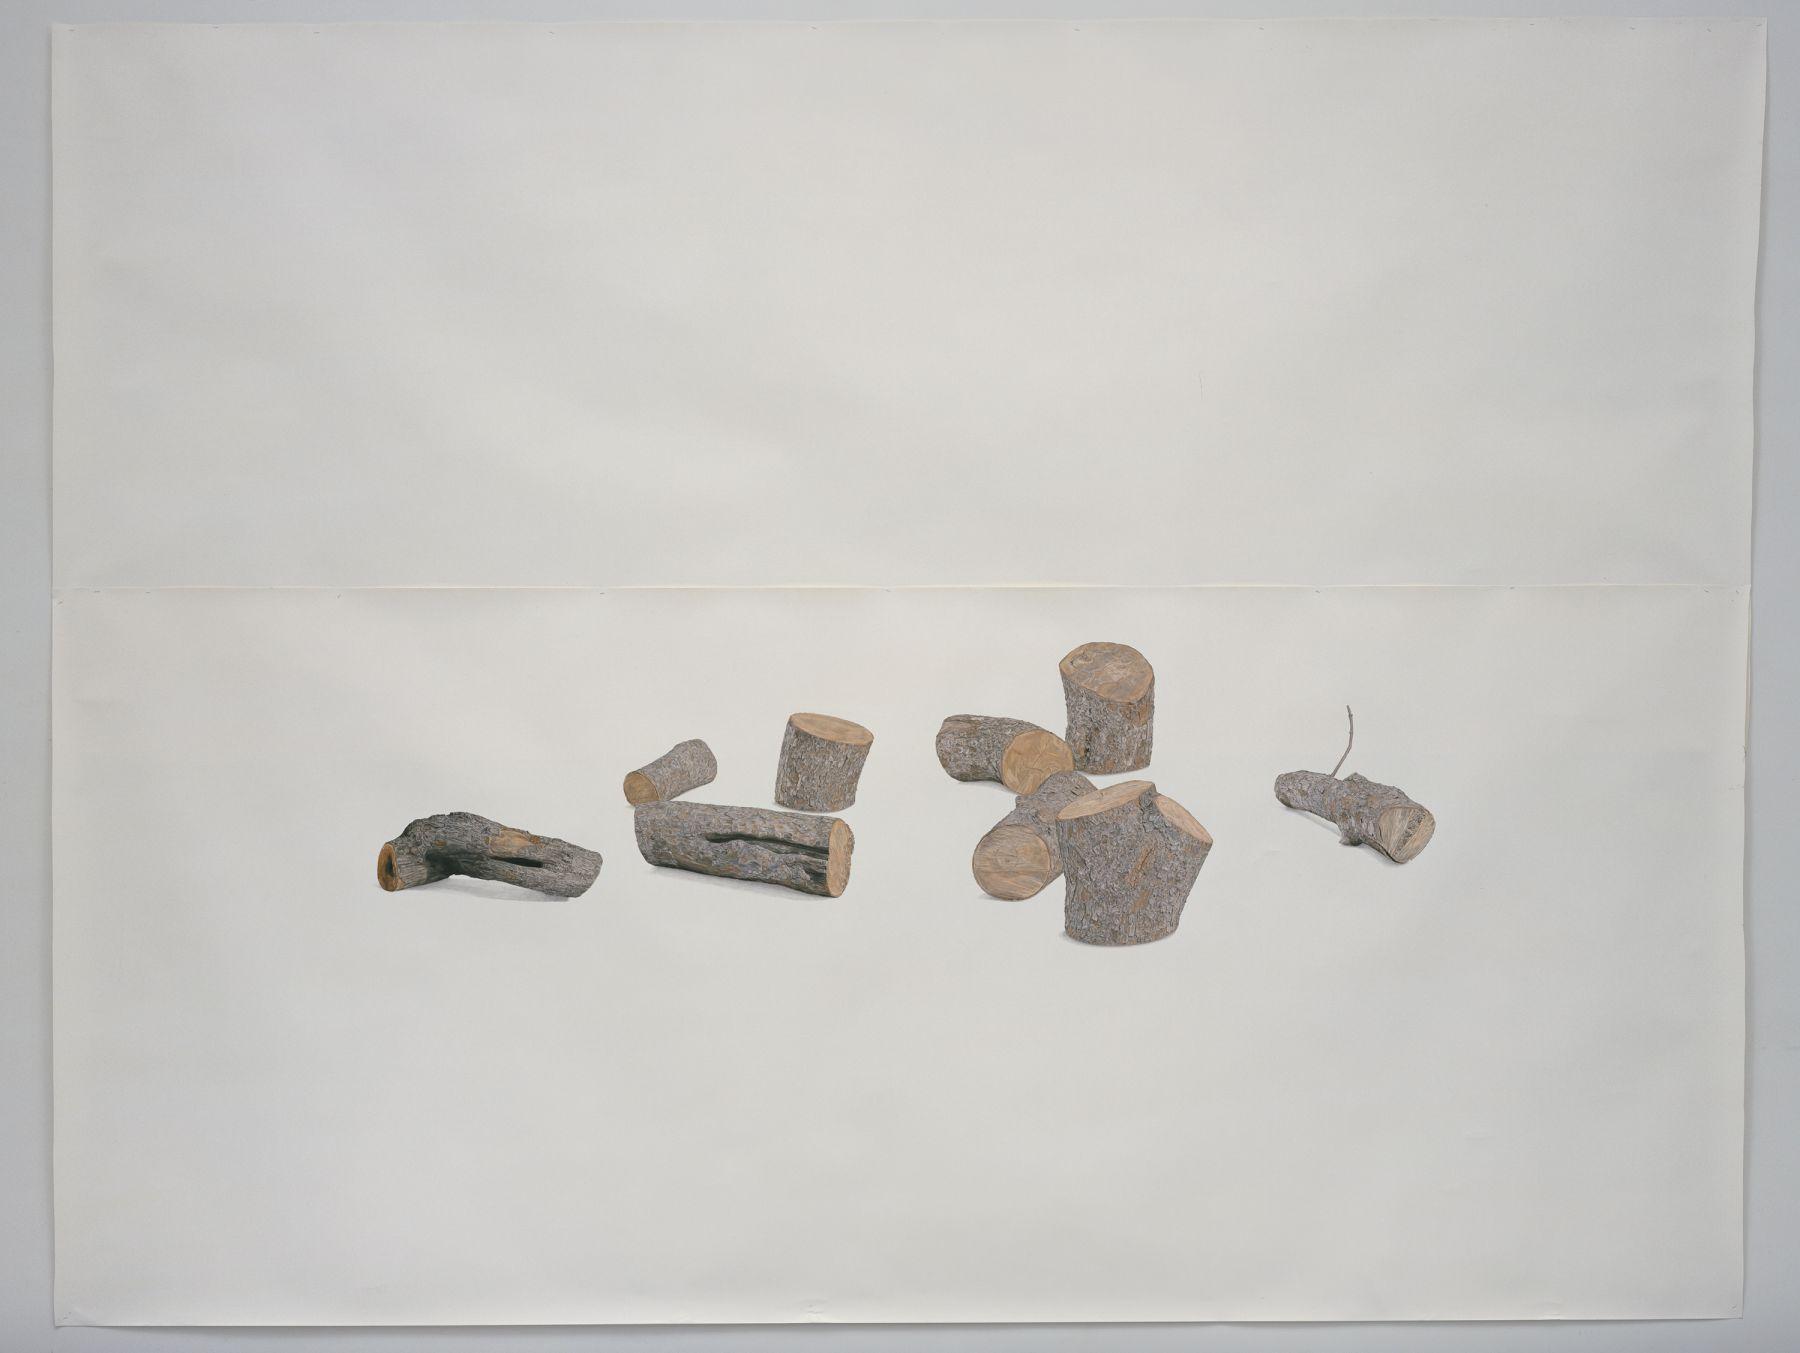 Toba Khedoori, Untitled (Logs)